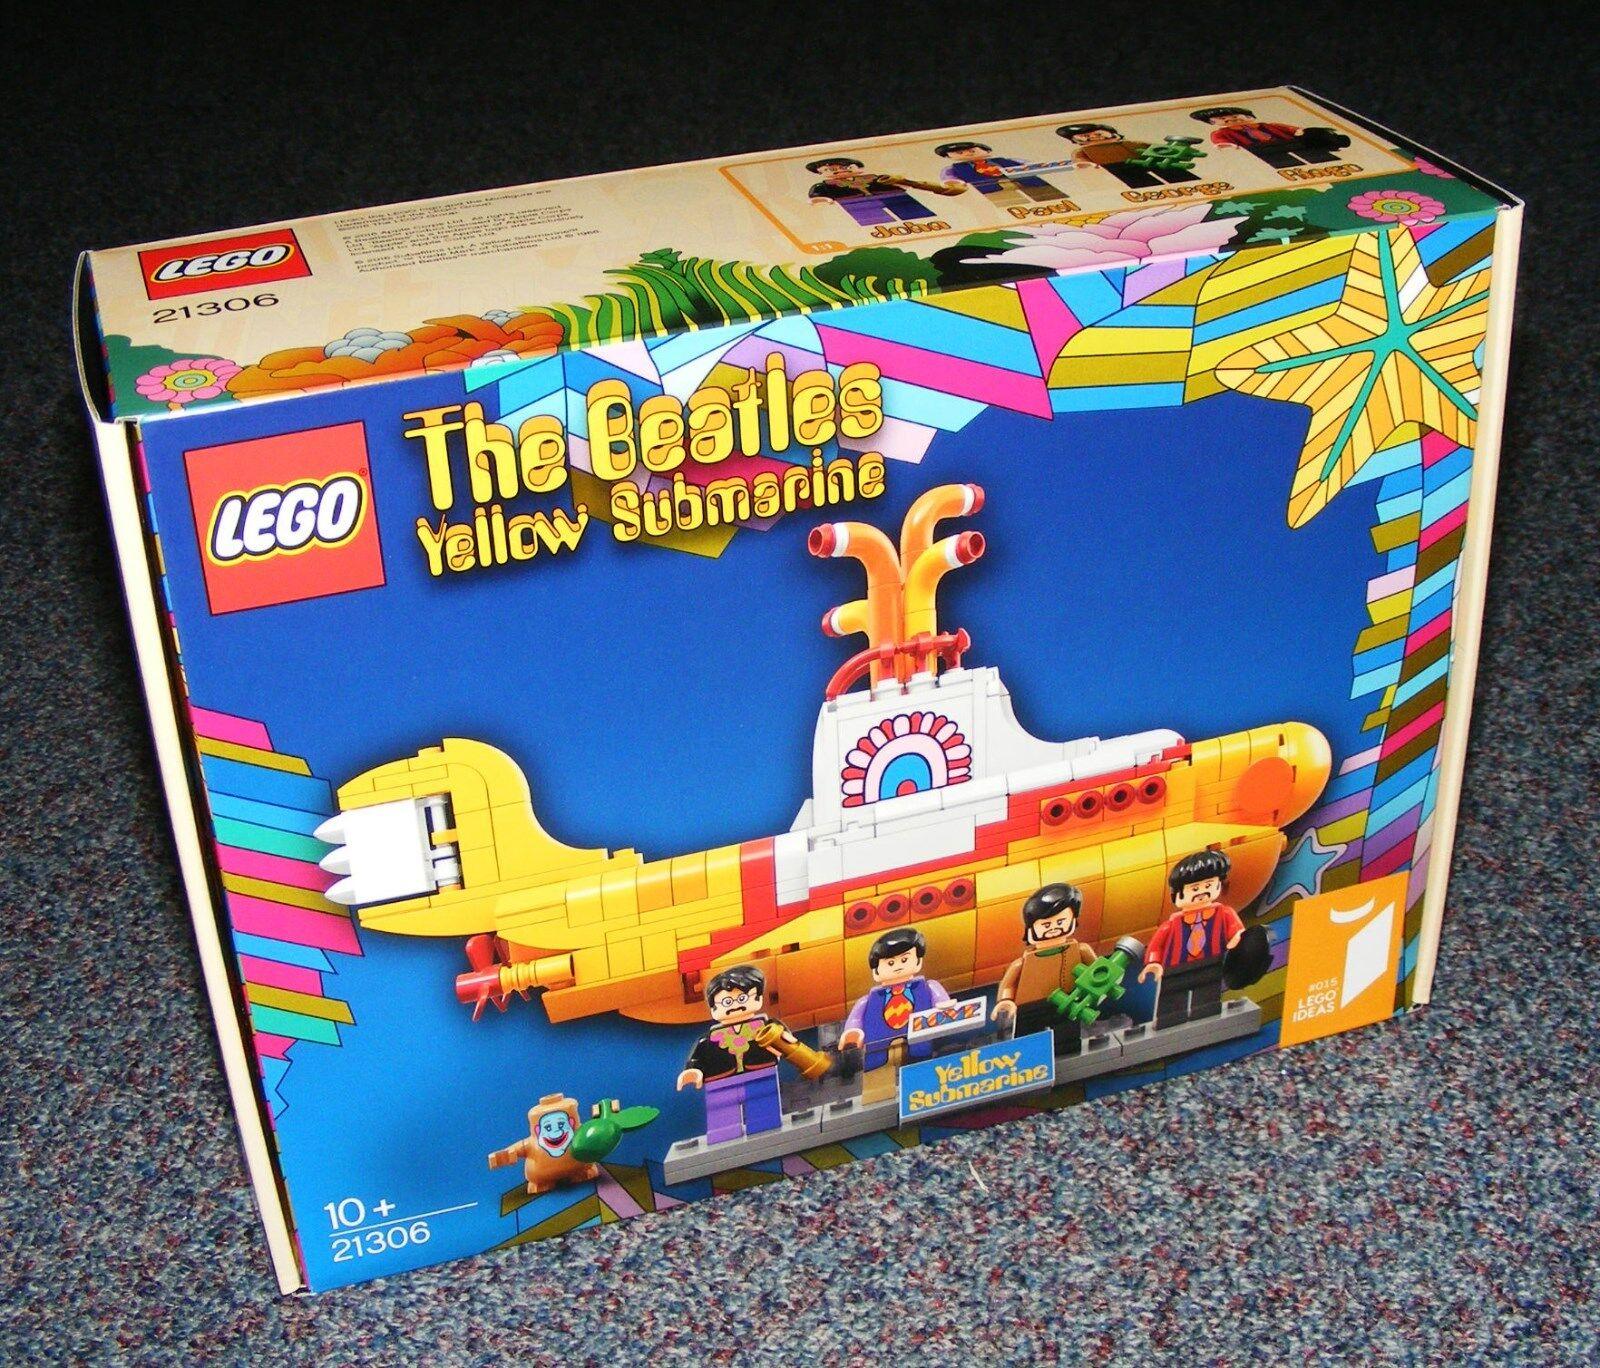 LEGO IDEAS THE BEATLES YELLOW SUBMARINE 21306 BRAND NEW SEALED